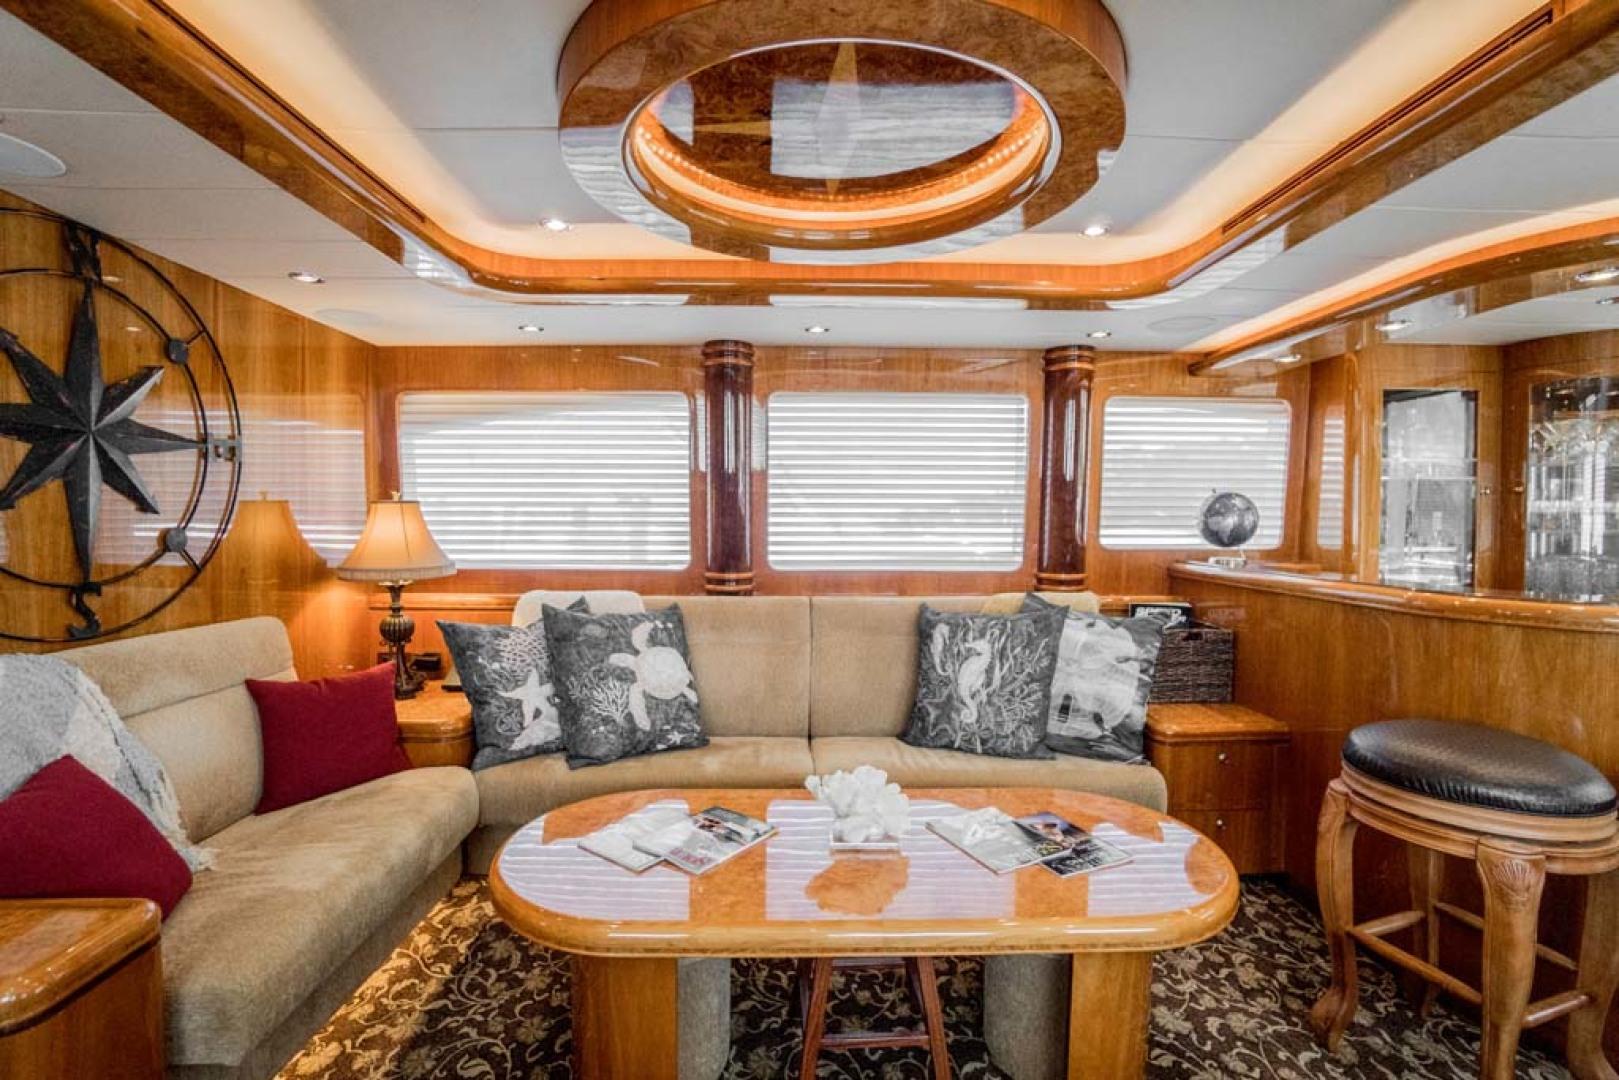 Horizon-Cockpit-Motor-Yacht-2008-Liberation-Stuart-Florida-United-States-Salon-Settee-and-Coffee-Table-1075323